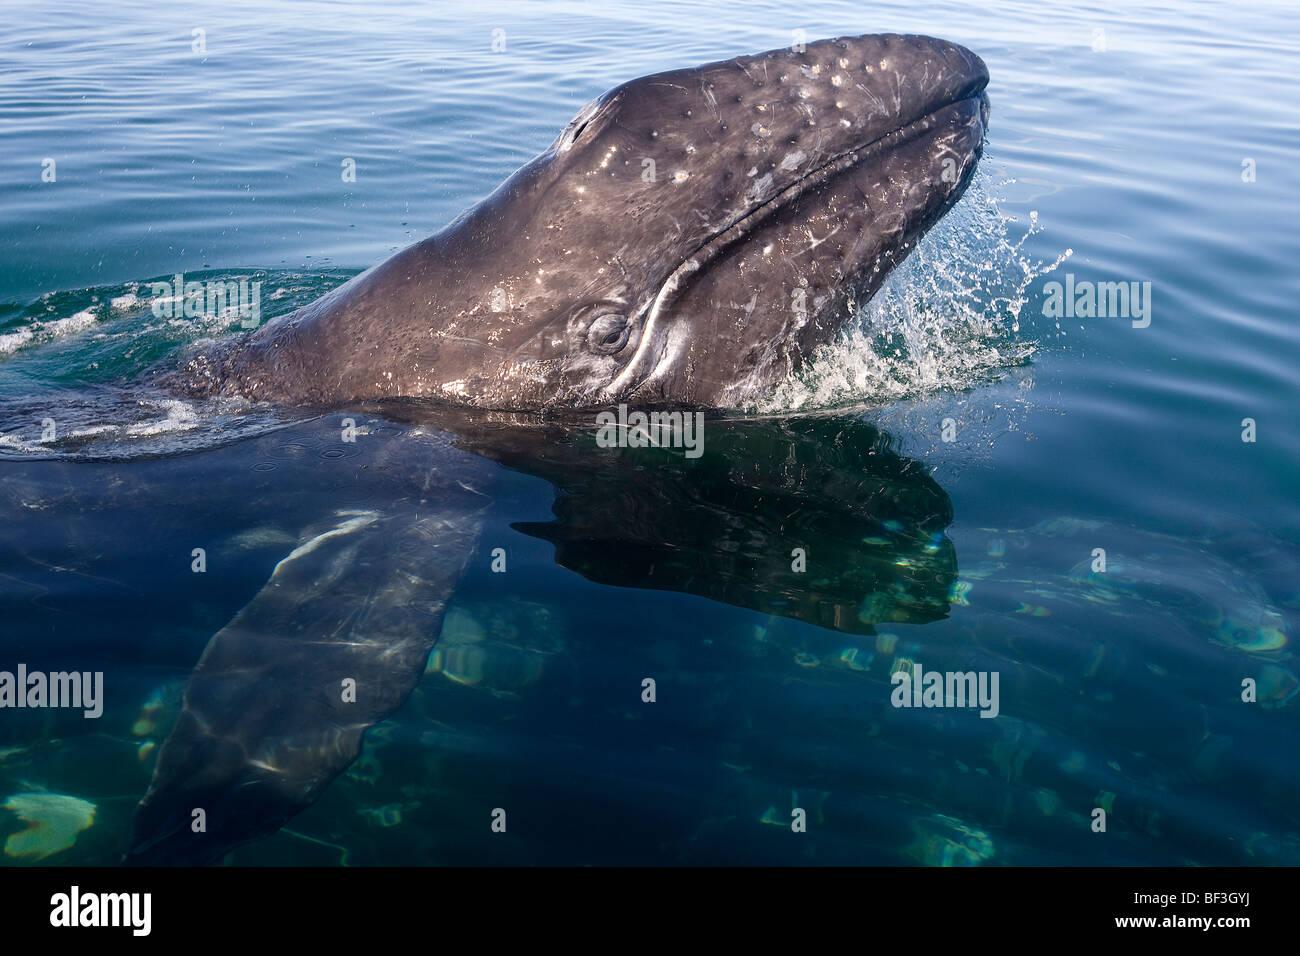 Baleine grise, la baleine grise (Eschrichtius robustus, Eschrichtius gibbosus). Avec tête de veau relevée Photo Stock